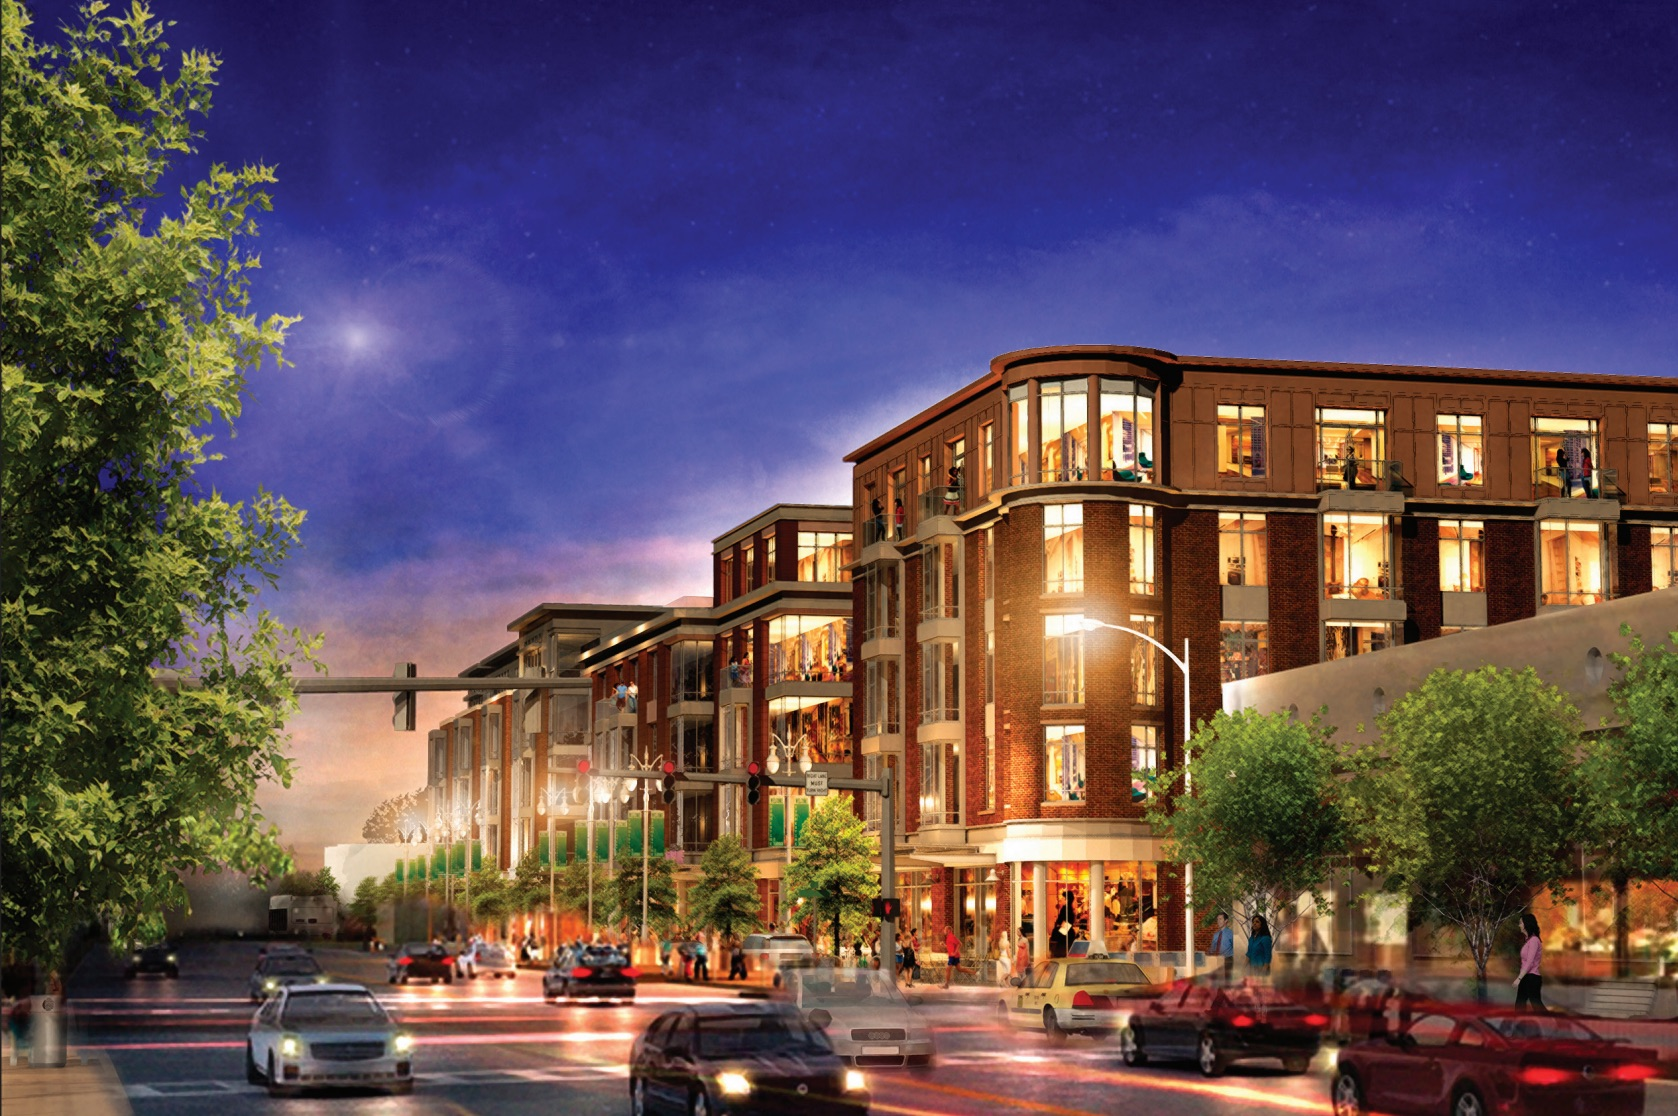 Washington place newtonville newton mixed use residential retail development mark investment